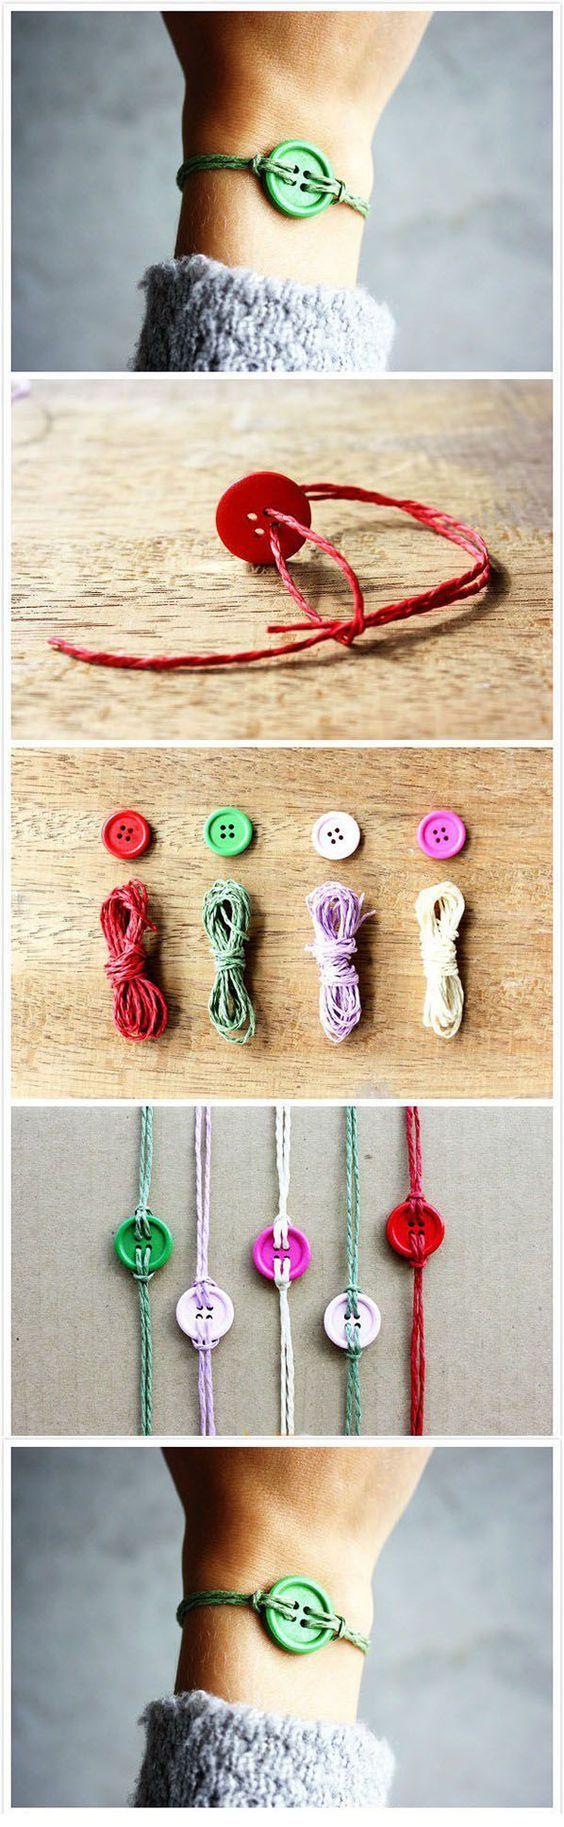 Cool Button Bracelet | DIY & Crafts Tutorials